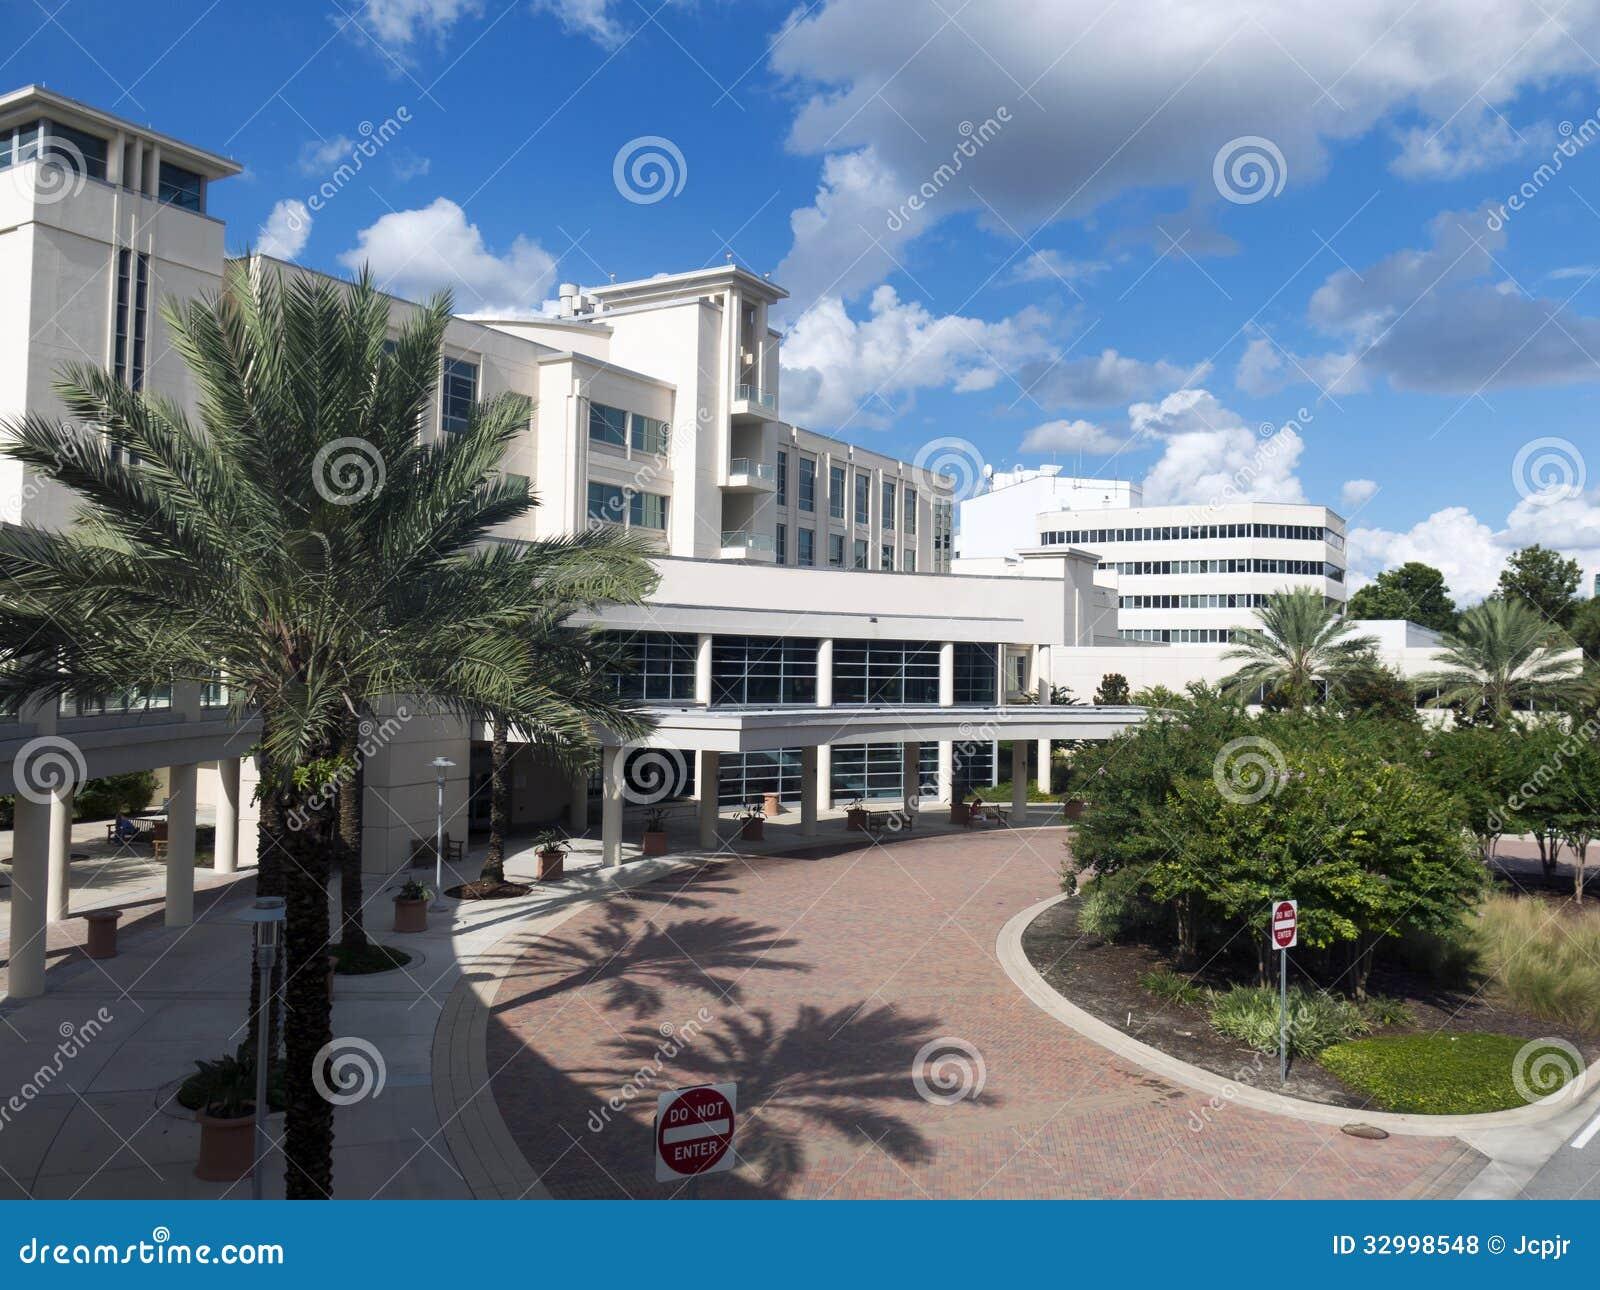 Modern Hospital Royalty Free Stock Photos Image 32998548